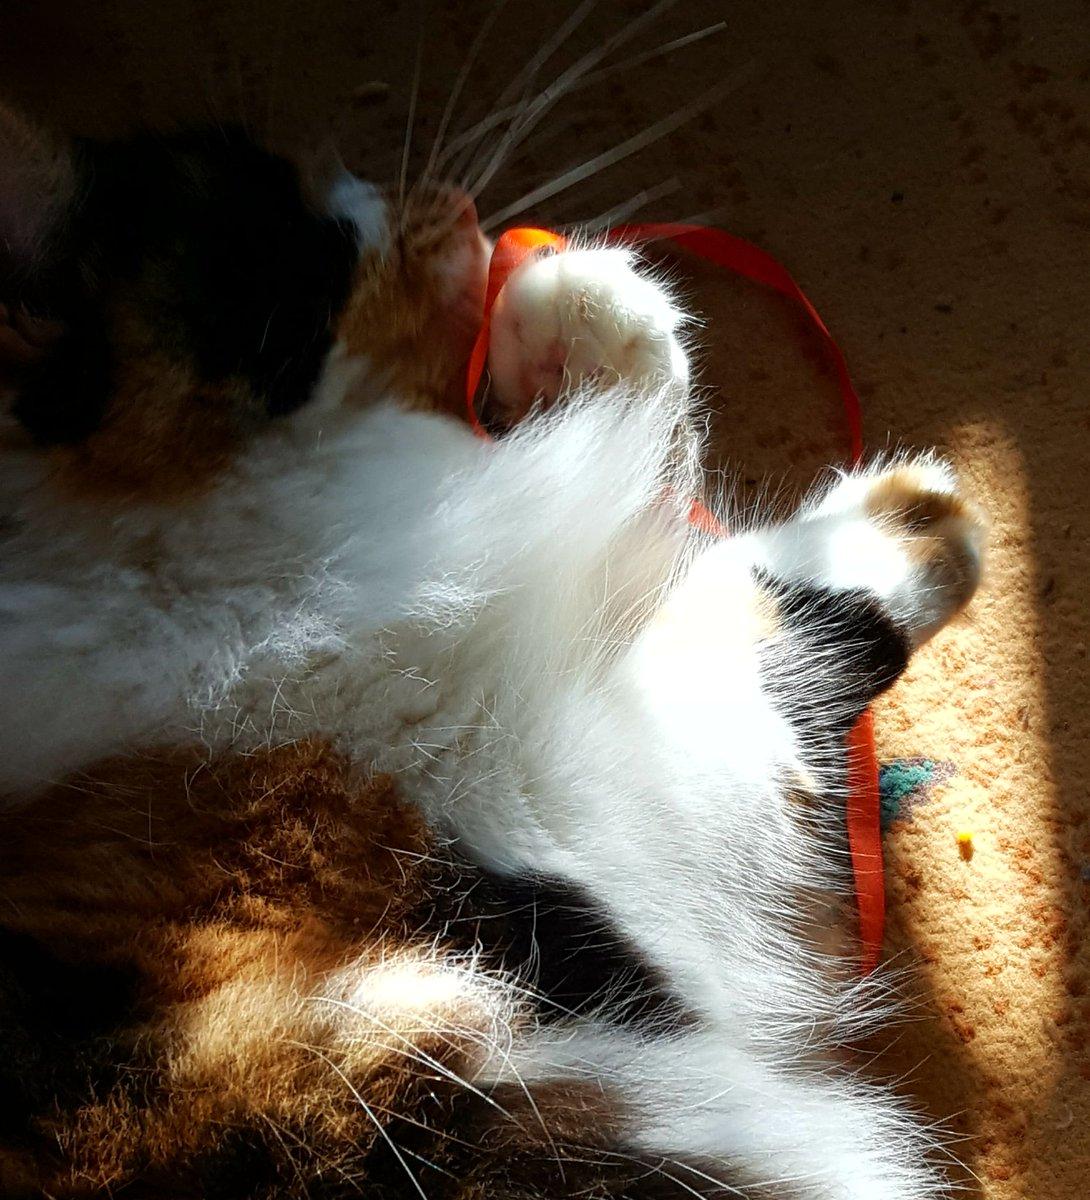 Missy wishes everyone a happy #Caturday #CatsOfTwitter   @LilithTheCat999 @Miss_1999 @kat3796 @ilove4paws @SpiessensVicky @planetpakua @littlekatmom @KaraNUFC @TiffyLaw3 @linalan96 @PaperPie @Eugenia62020609 @LordVining @BlaineRincon